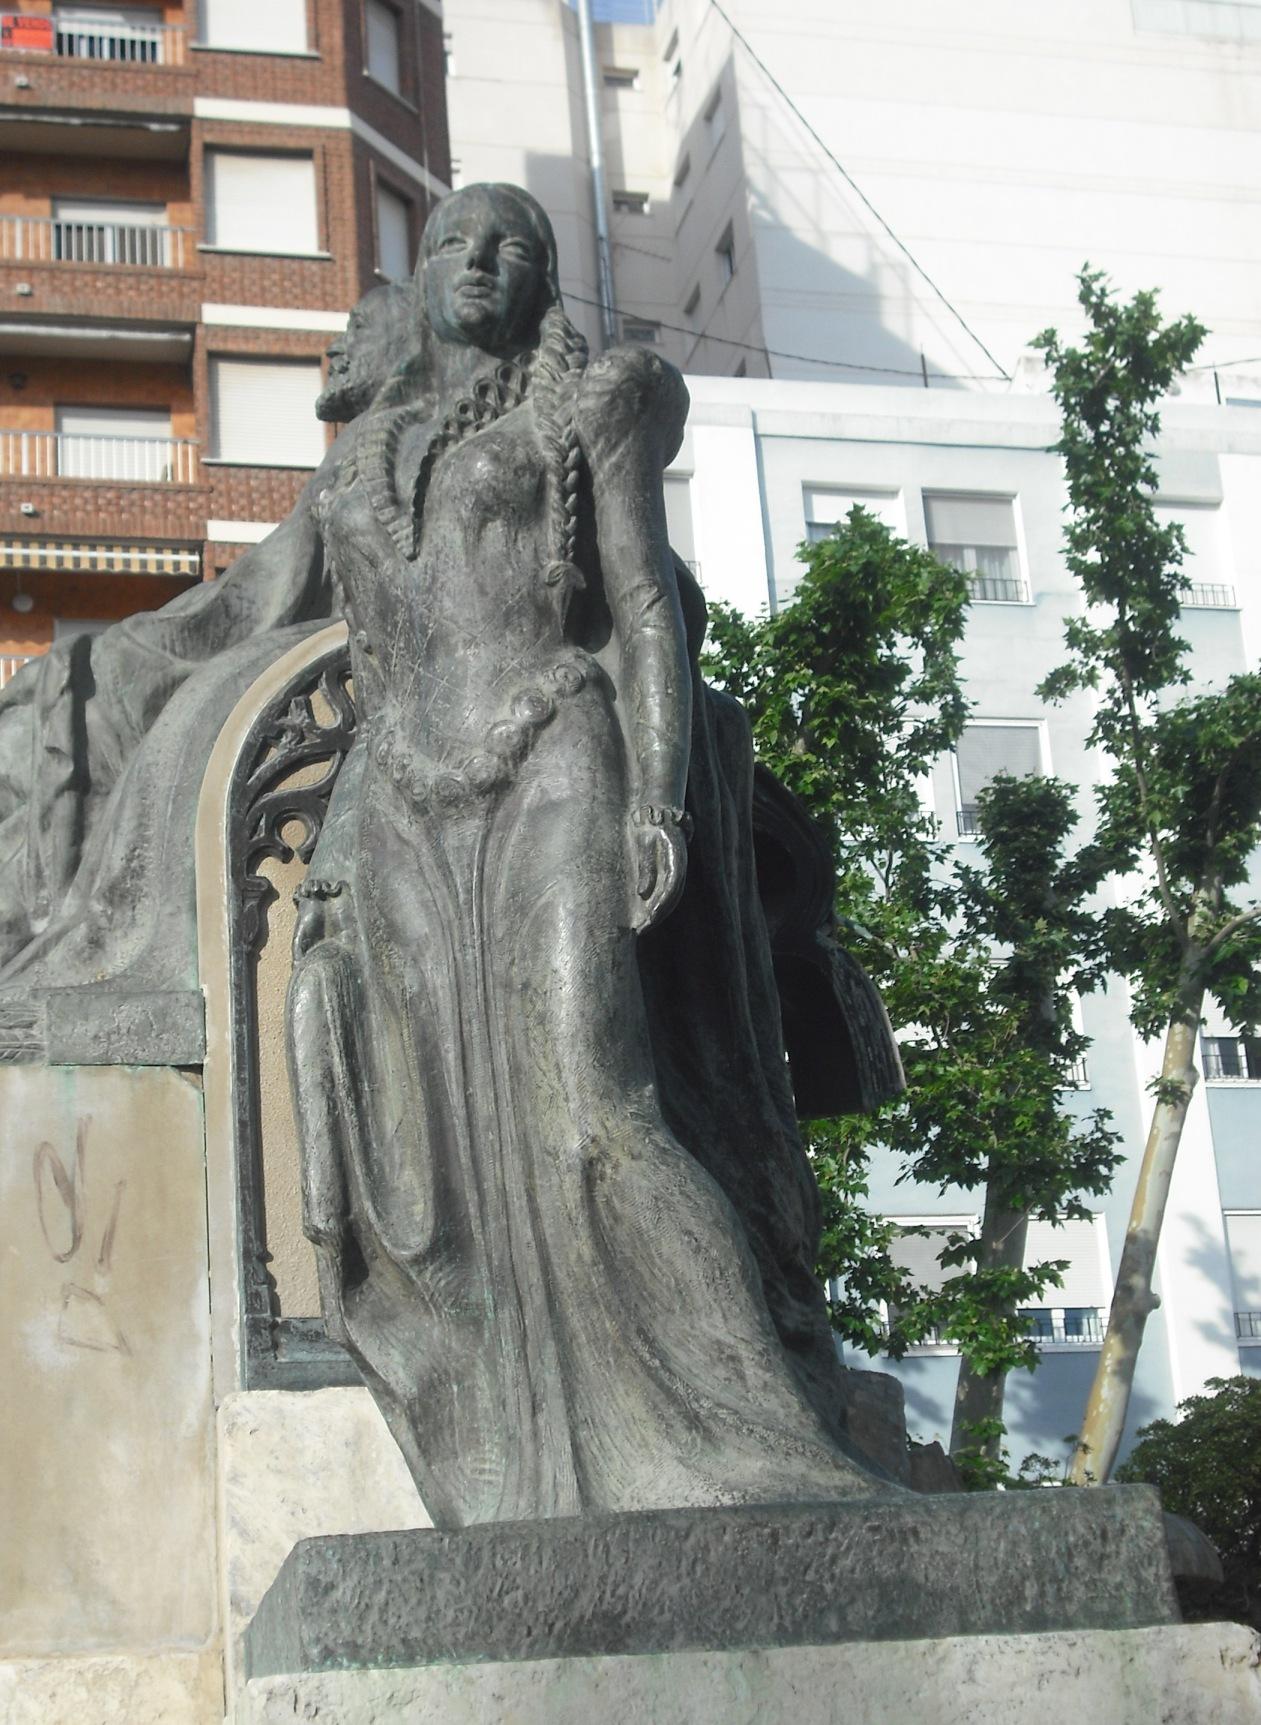 De paseo con la abuela tetonabig boob gilf - 2 part 7